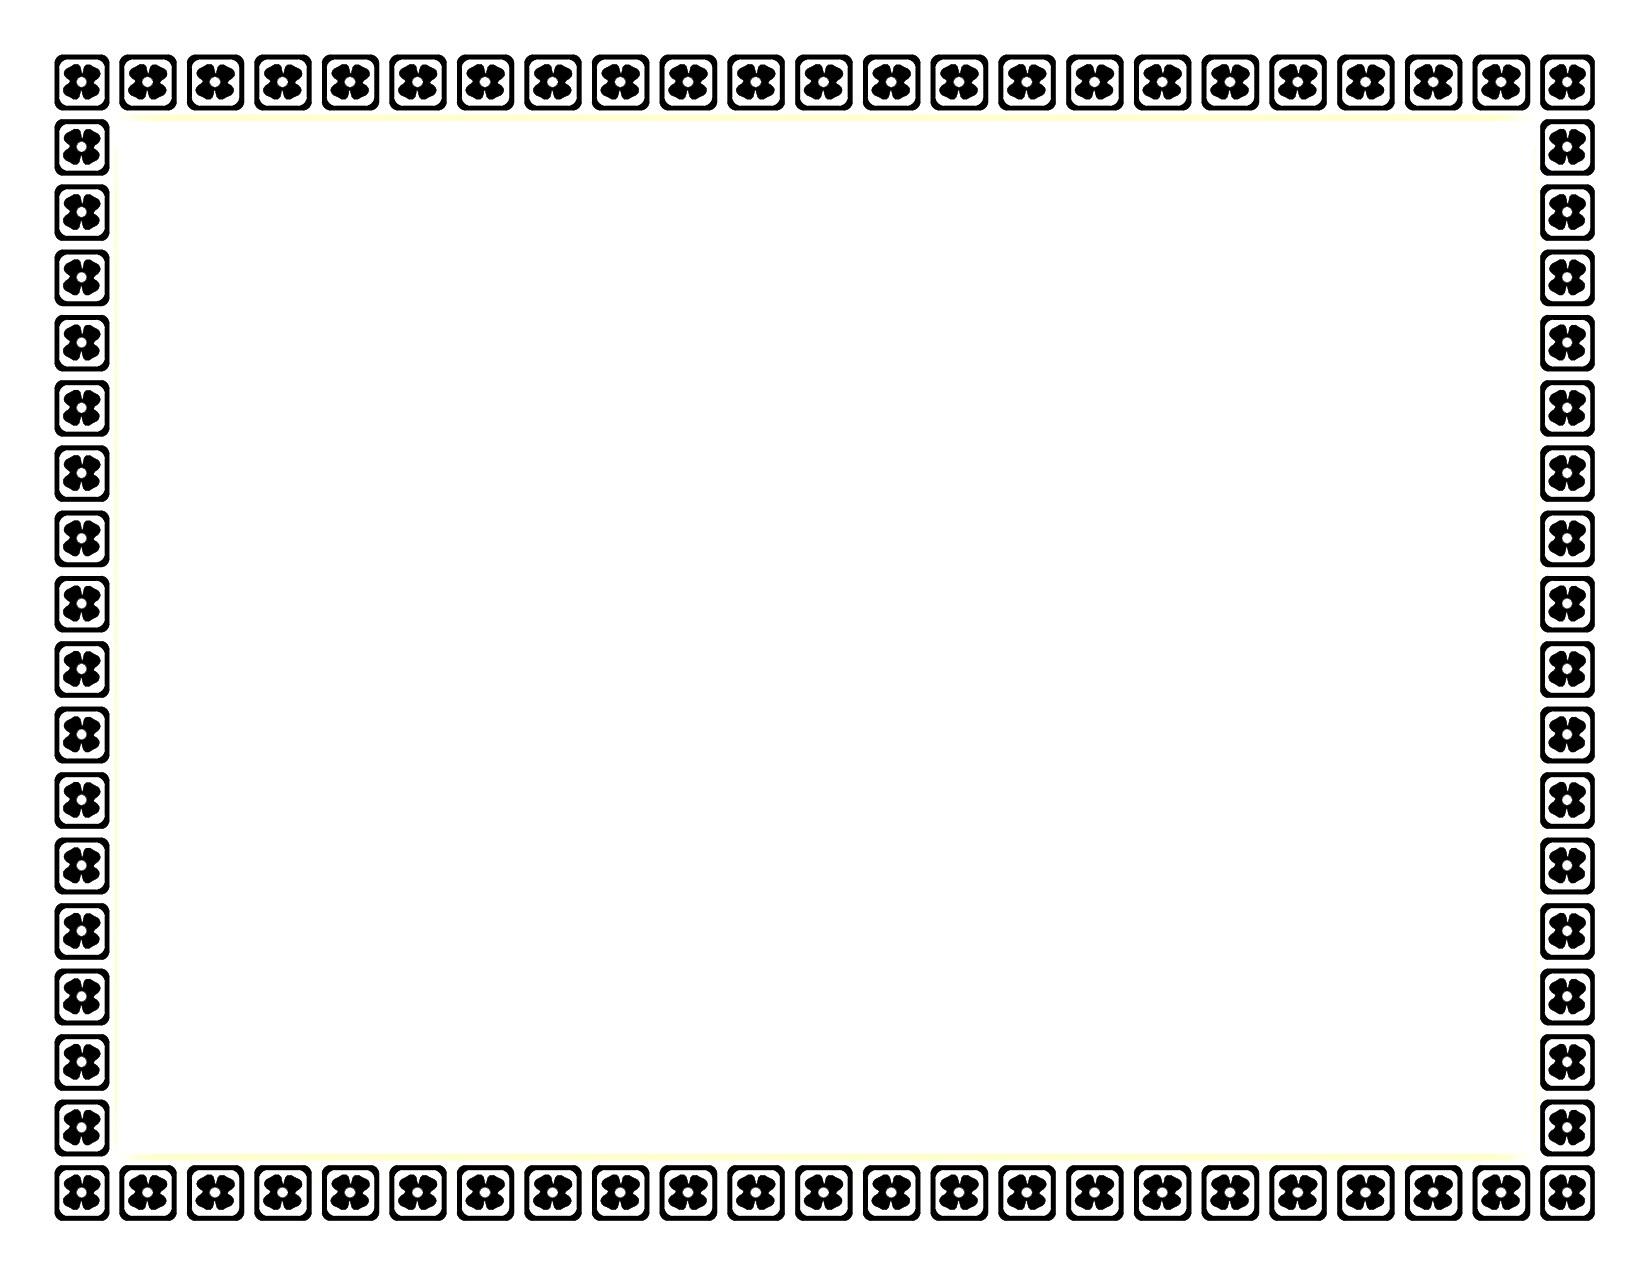 15 Borders Designs Color Frames Images